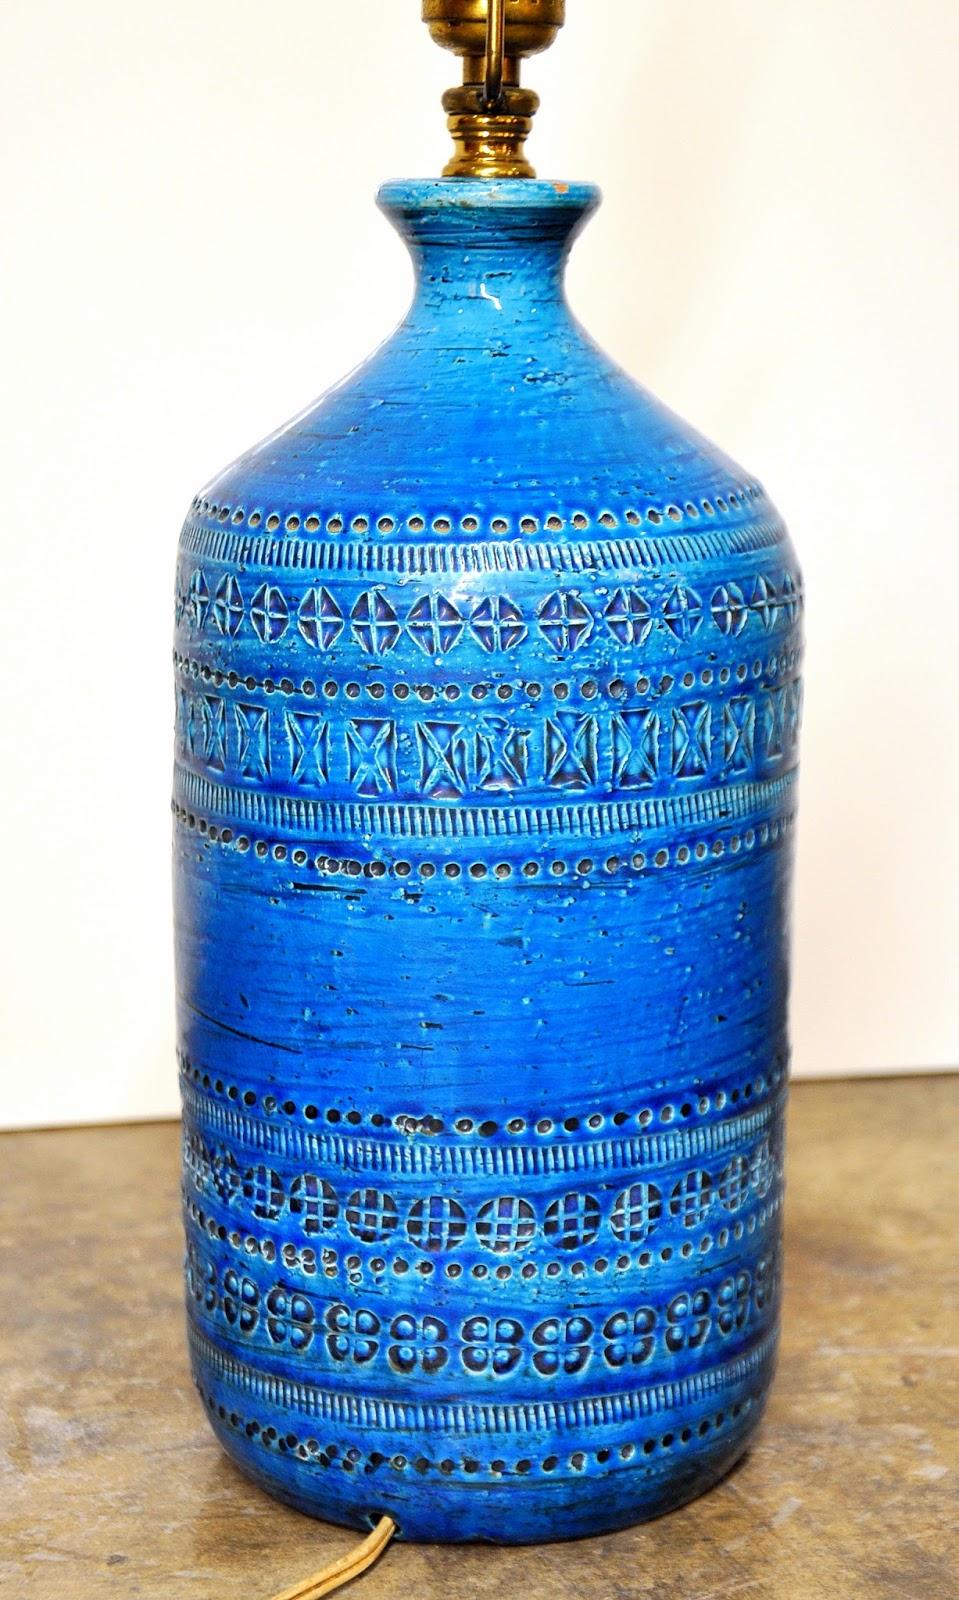 Select Modern Also Londi Rimini Blu Bitossi Table Lamp